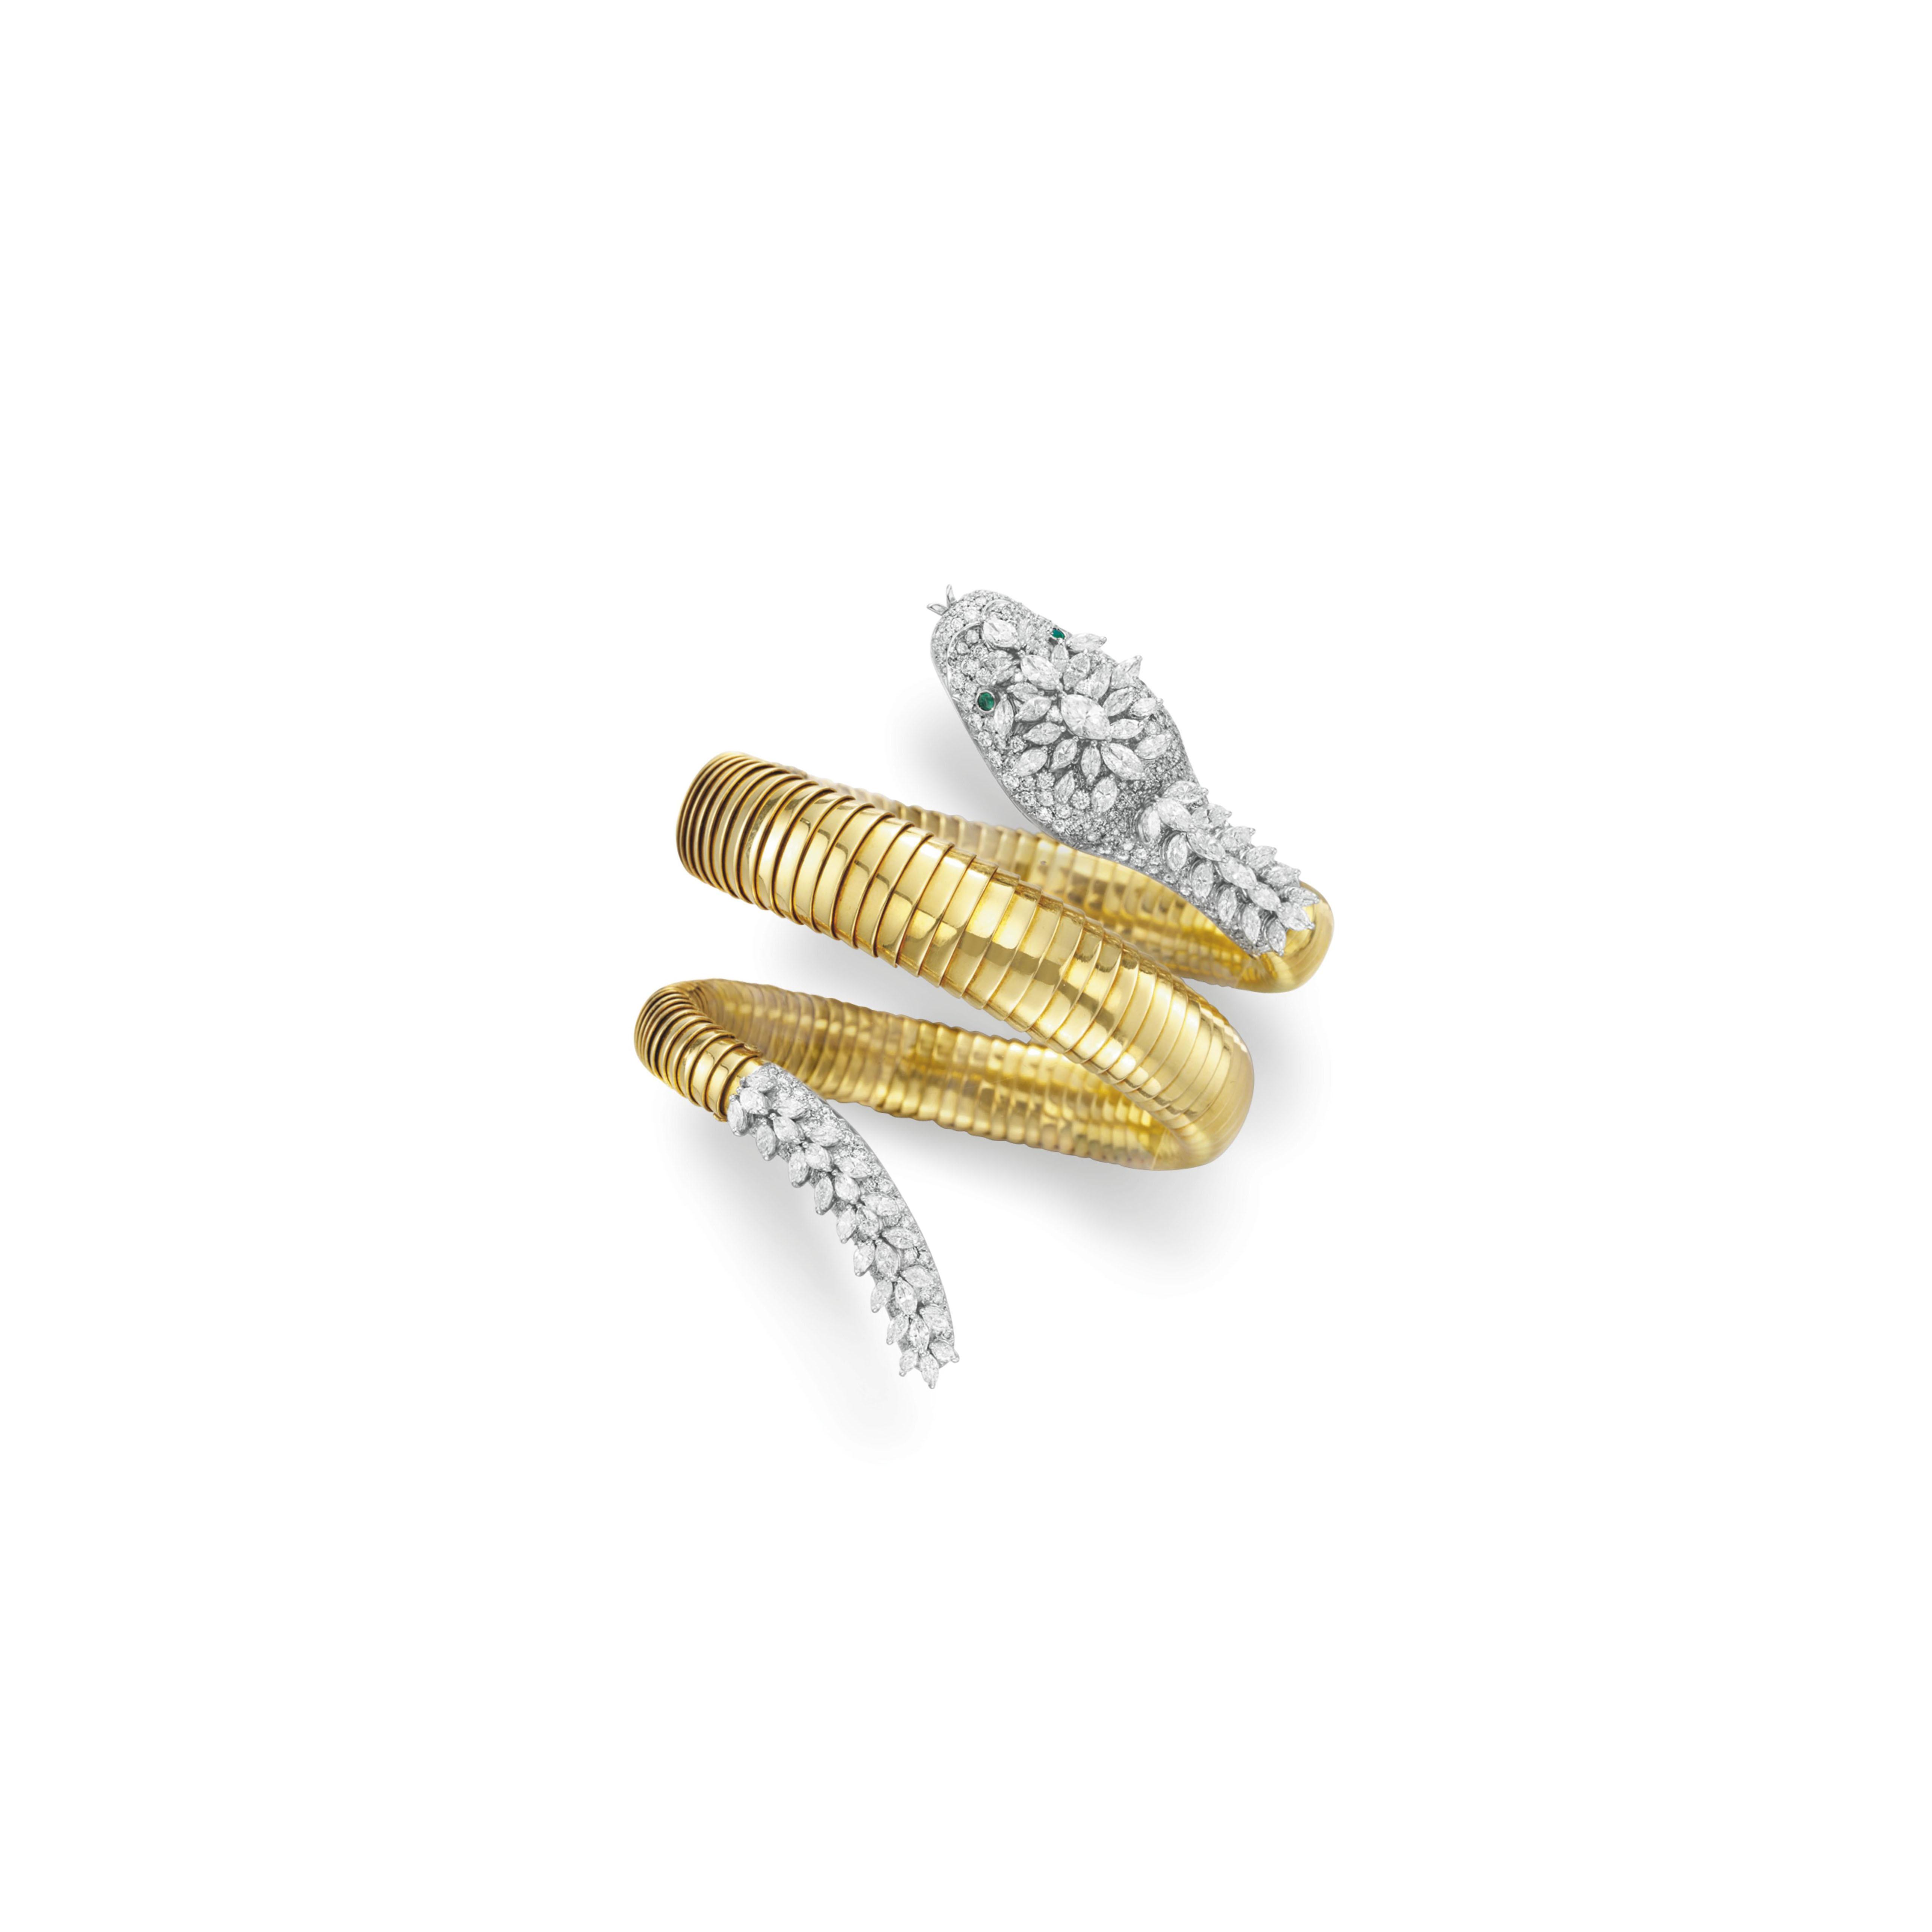 "A DIAMOND, EMERALD AND GOLD ""SNAKE"" BRACELET WATCH, BY BVLGARI"